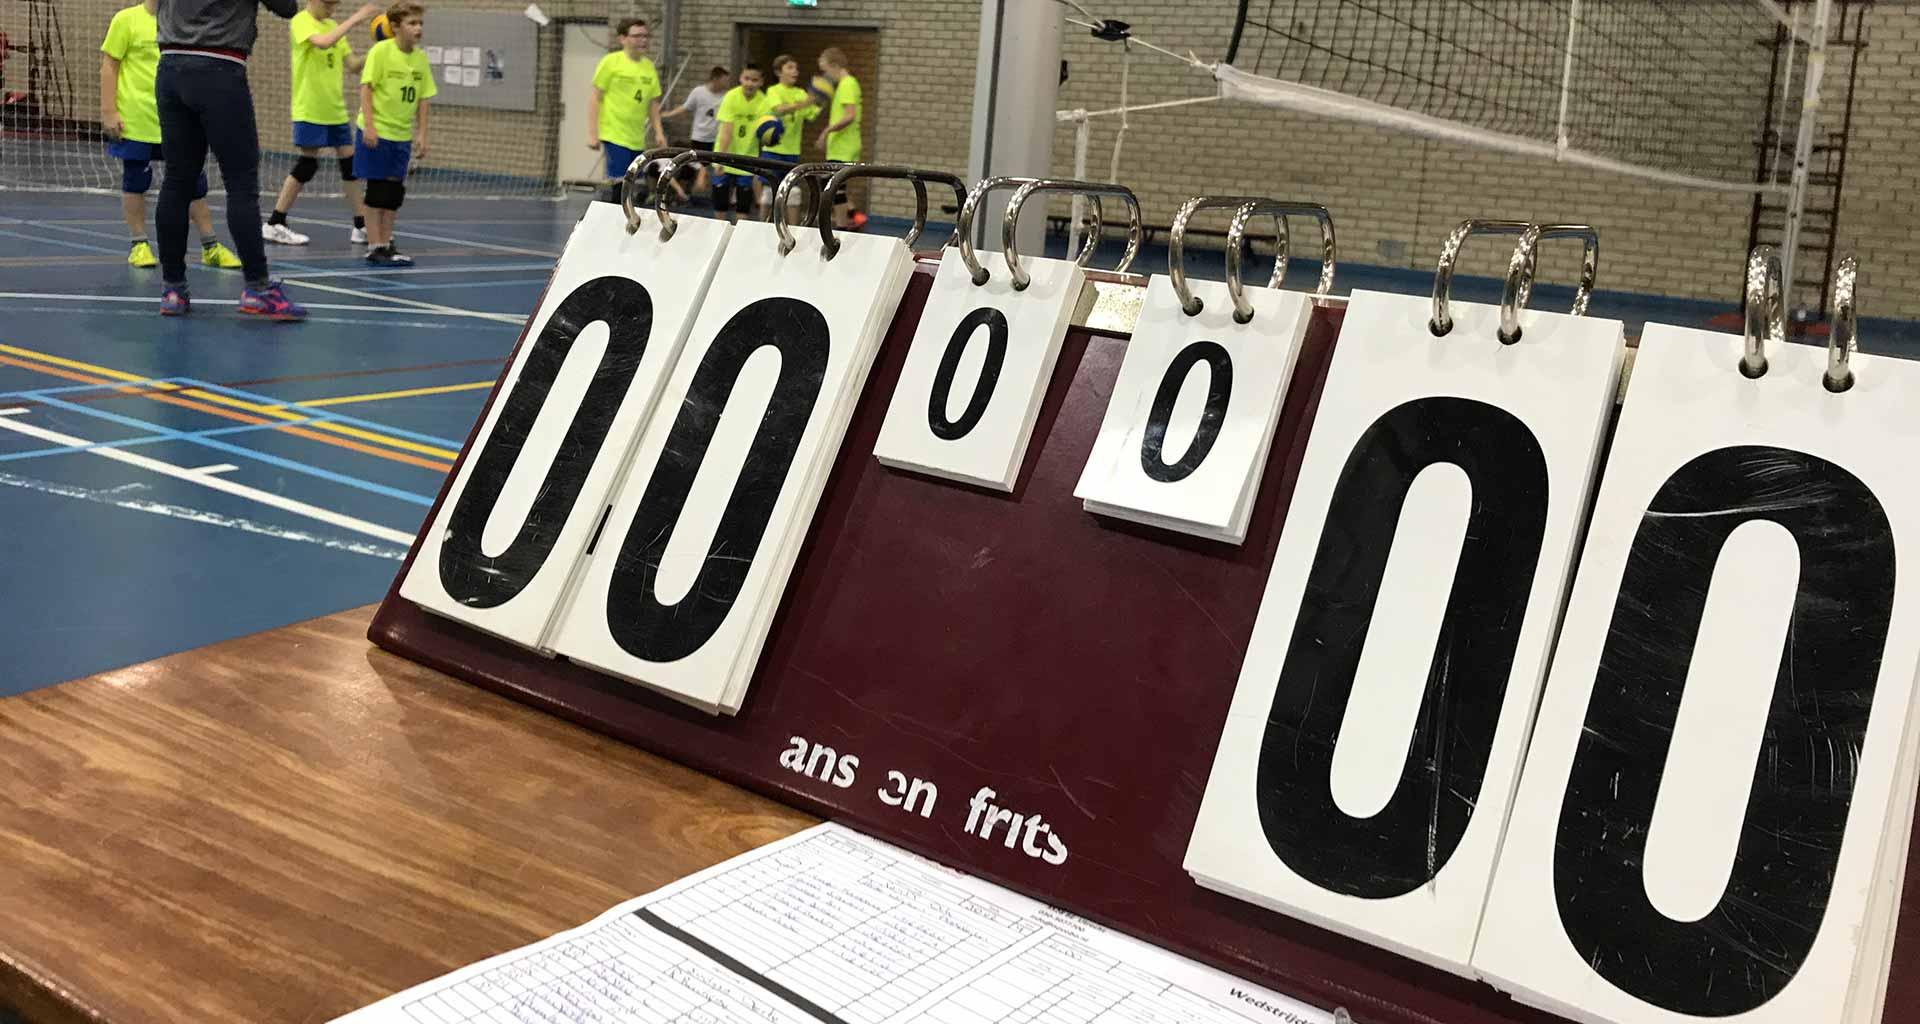 https://www.volleybal-dok.nl/wp-content/uploads/2018/12/wedstrijden-1.jpg